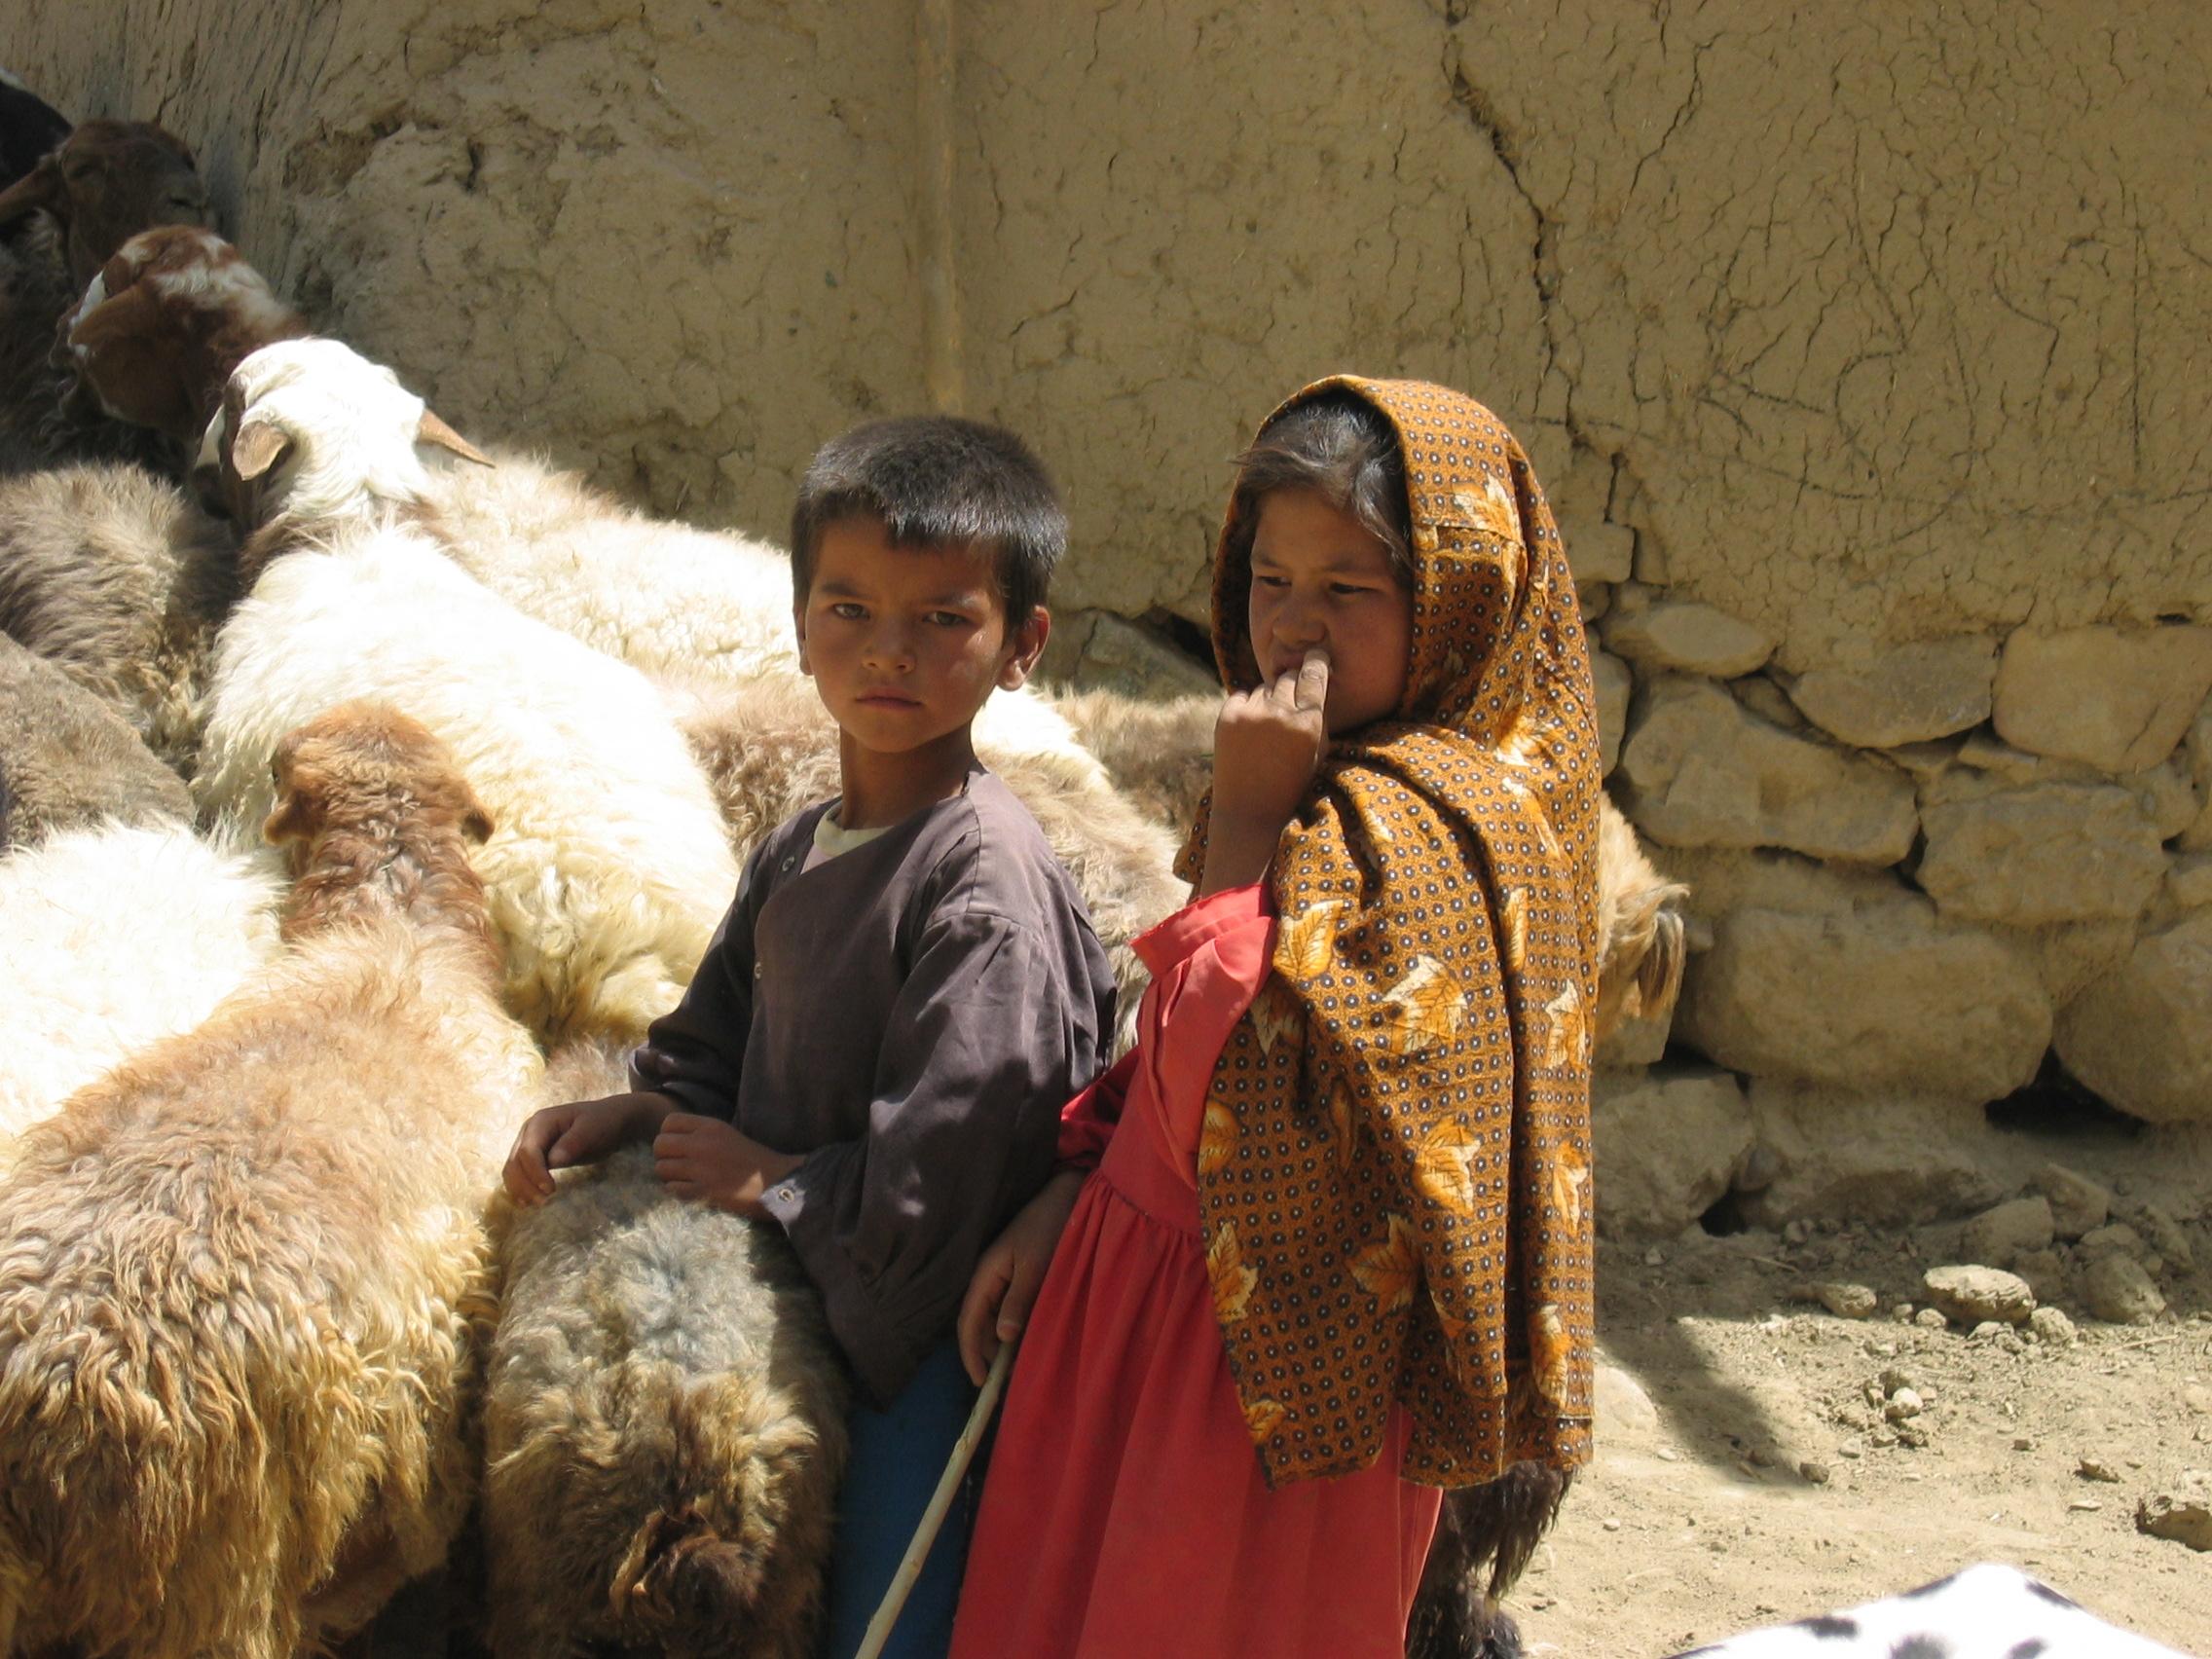 File:Goat farming Afghanistan jpg - Wikimedia Commons